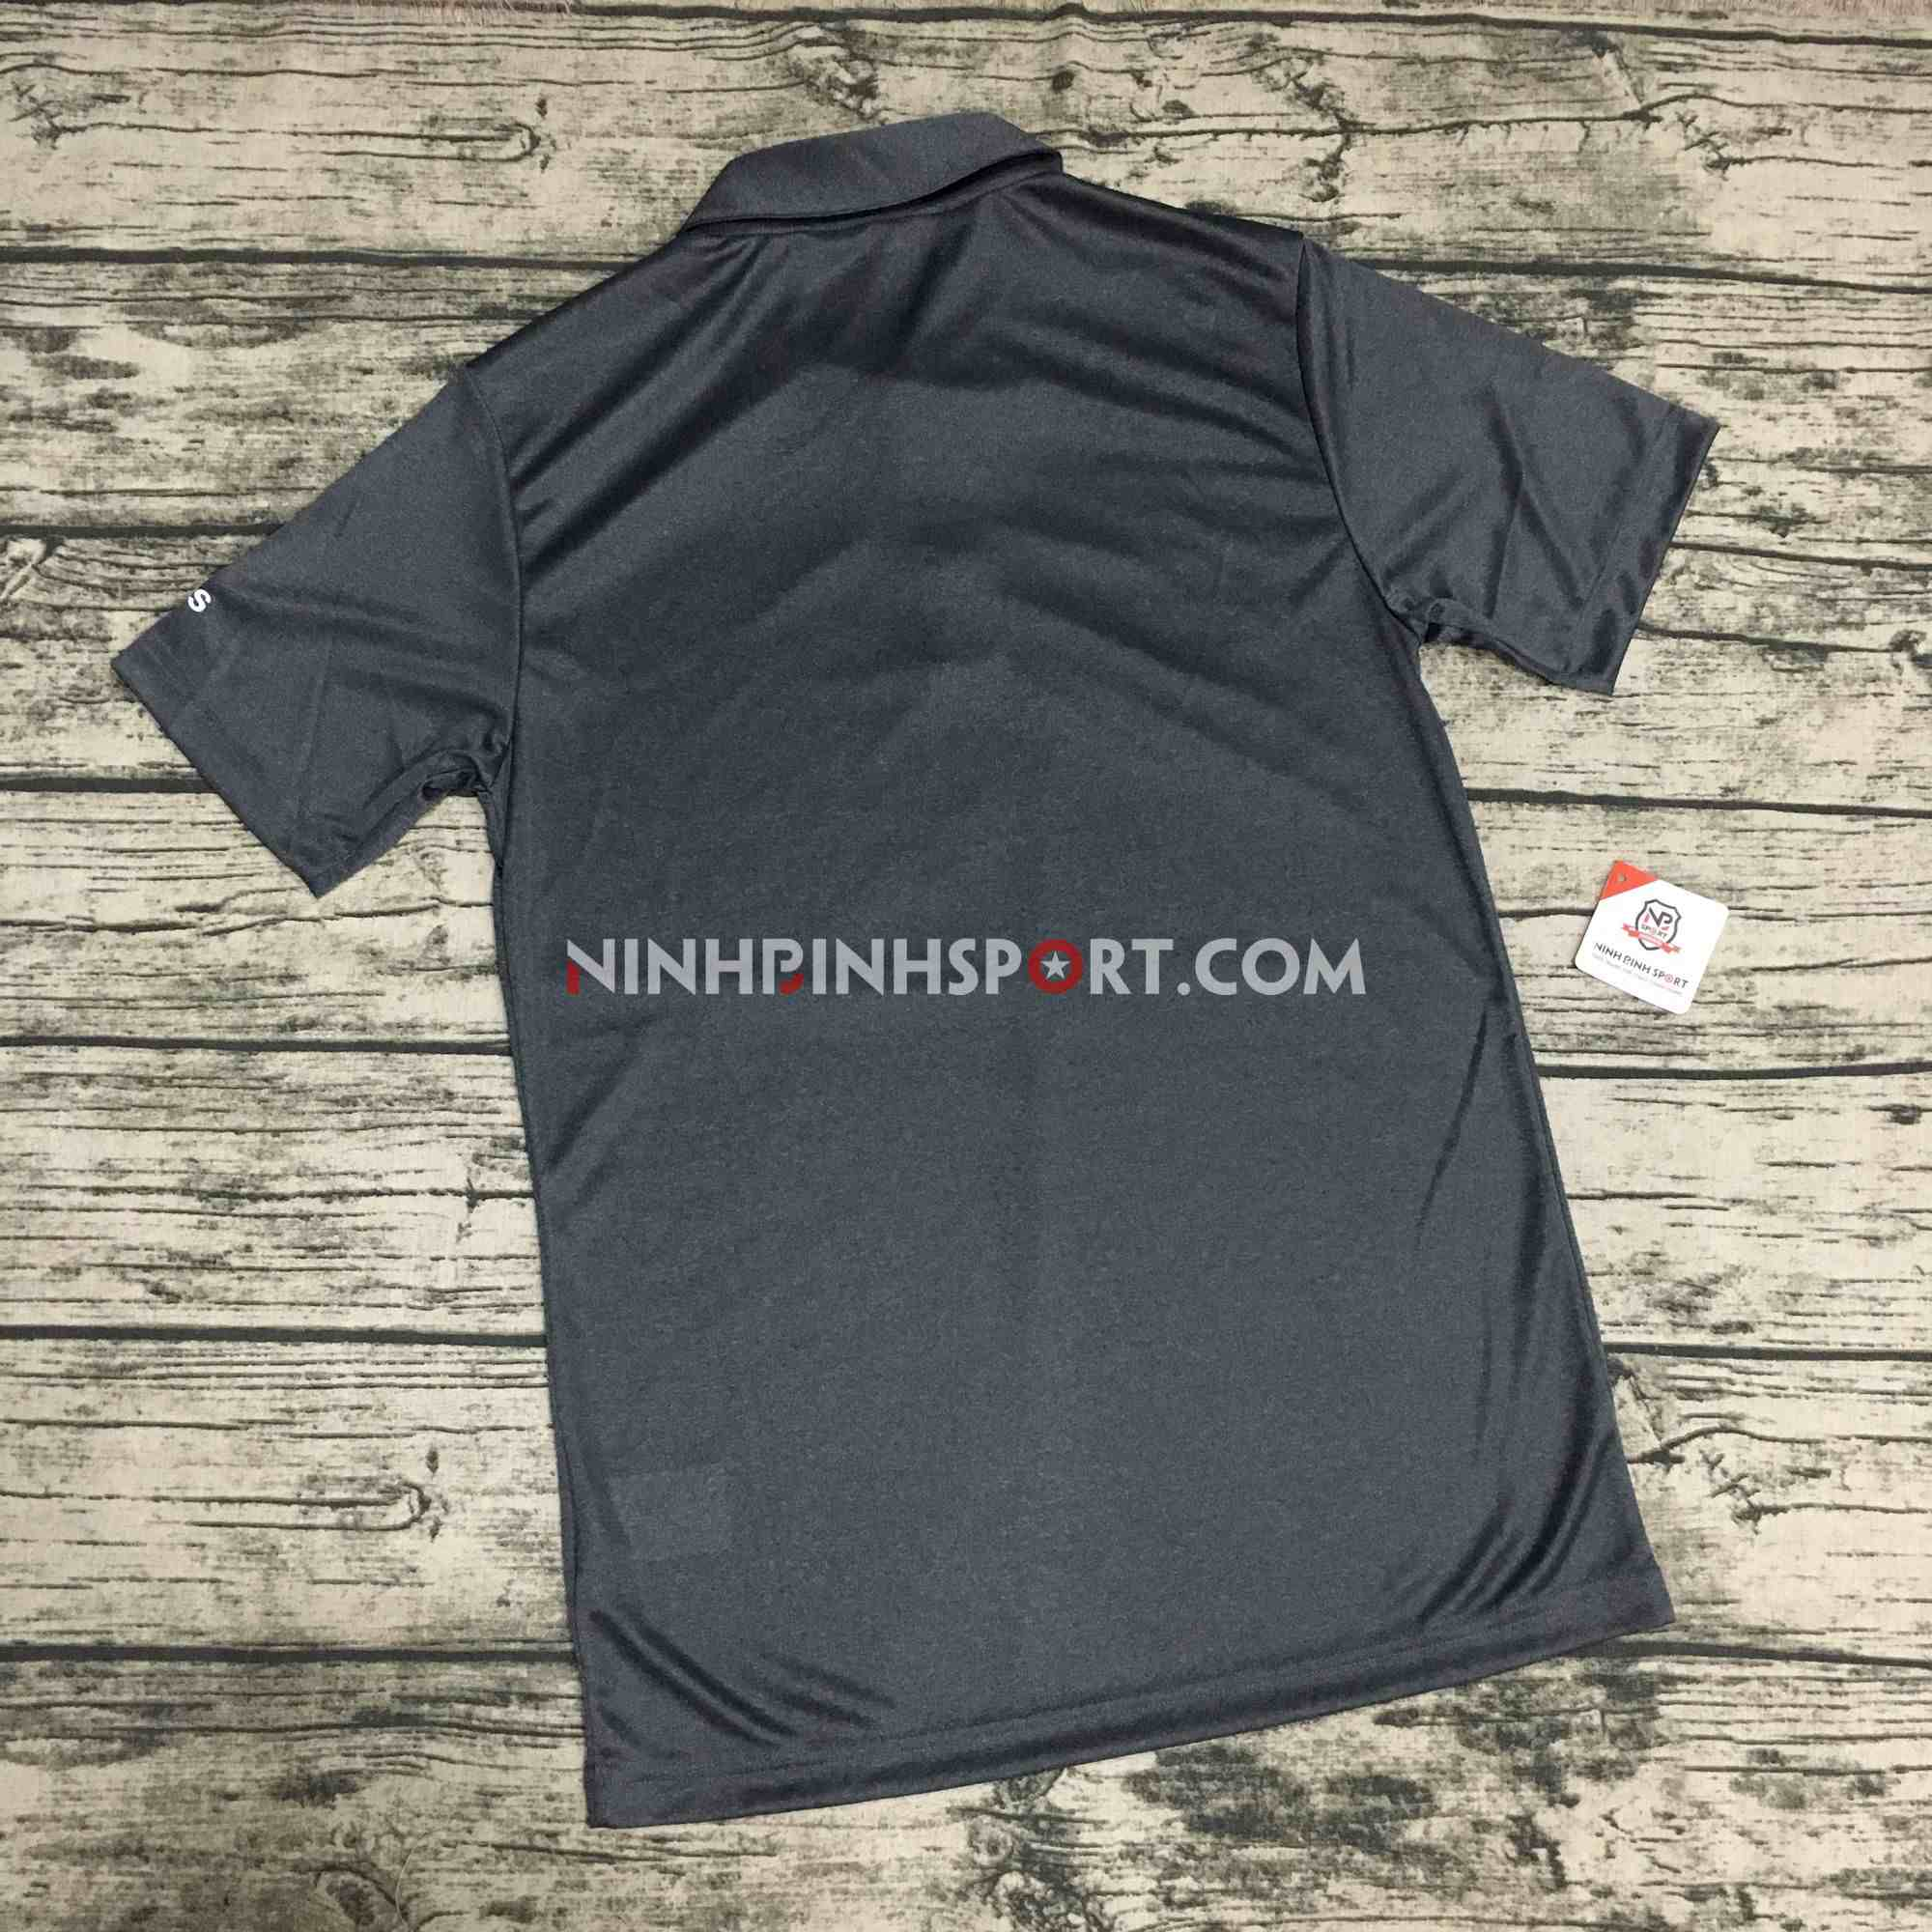 Áo thể thao nam Adidas Golf Polo Shirt DW5599